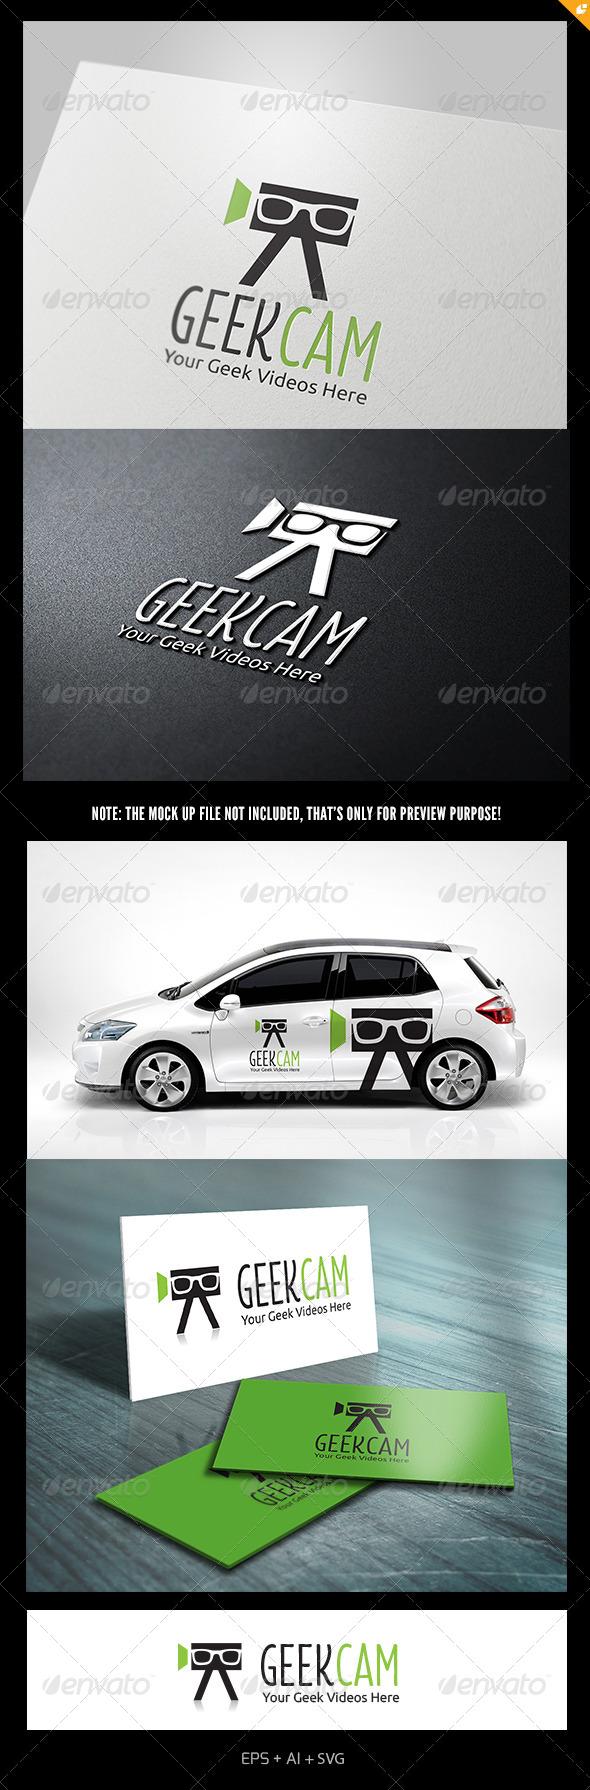 GraphicRiver Geek Cam 5899479